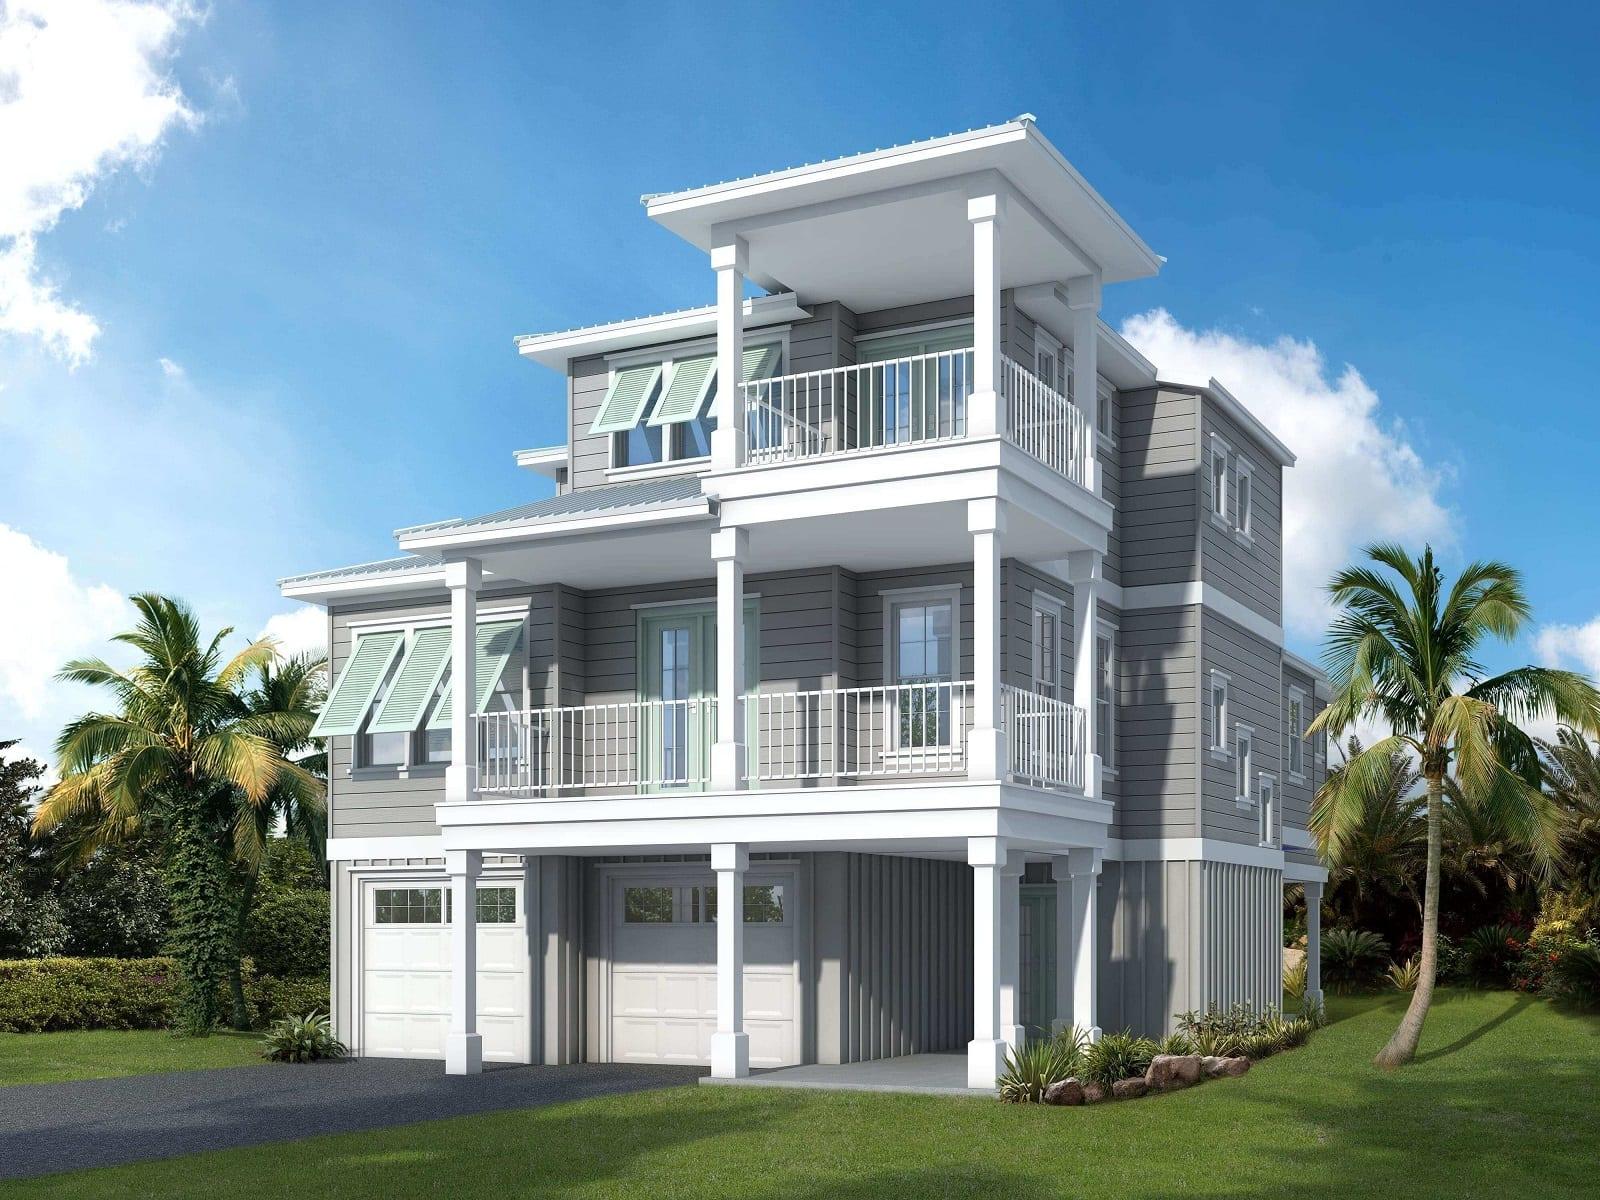 New custom home in South Jacksonville Beach built by Denneen Custom Homes